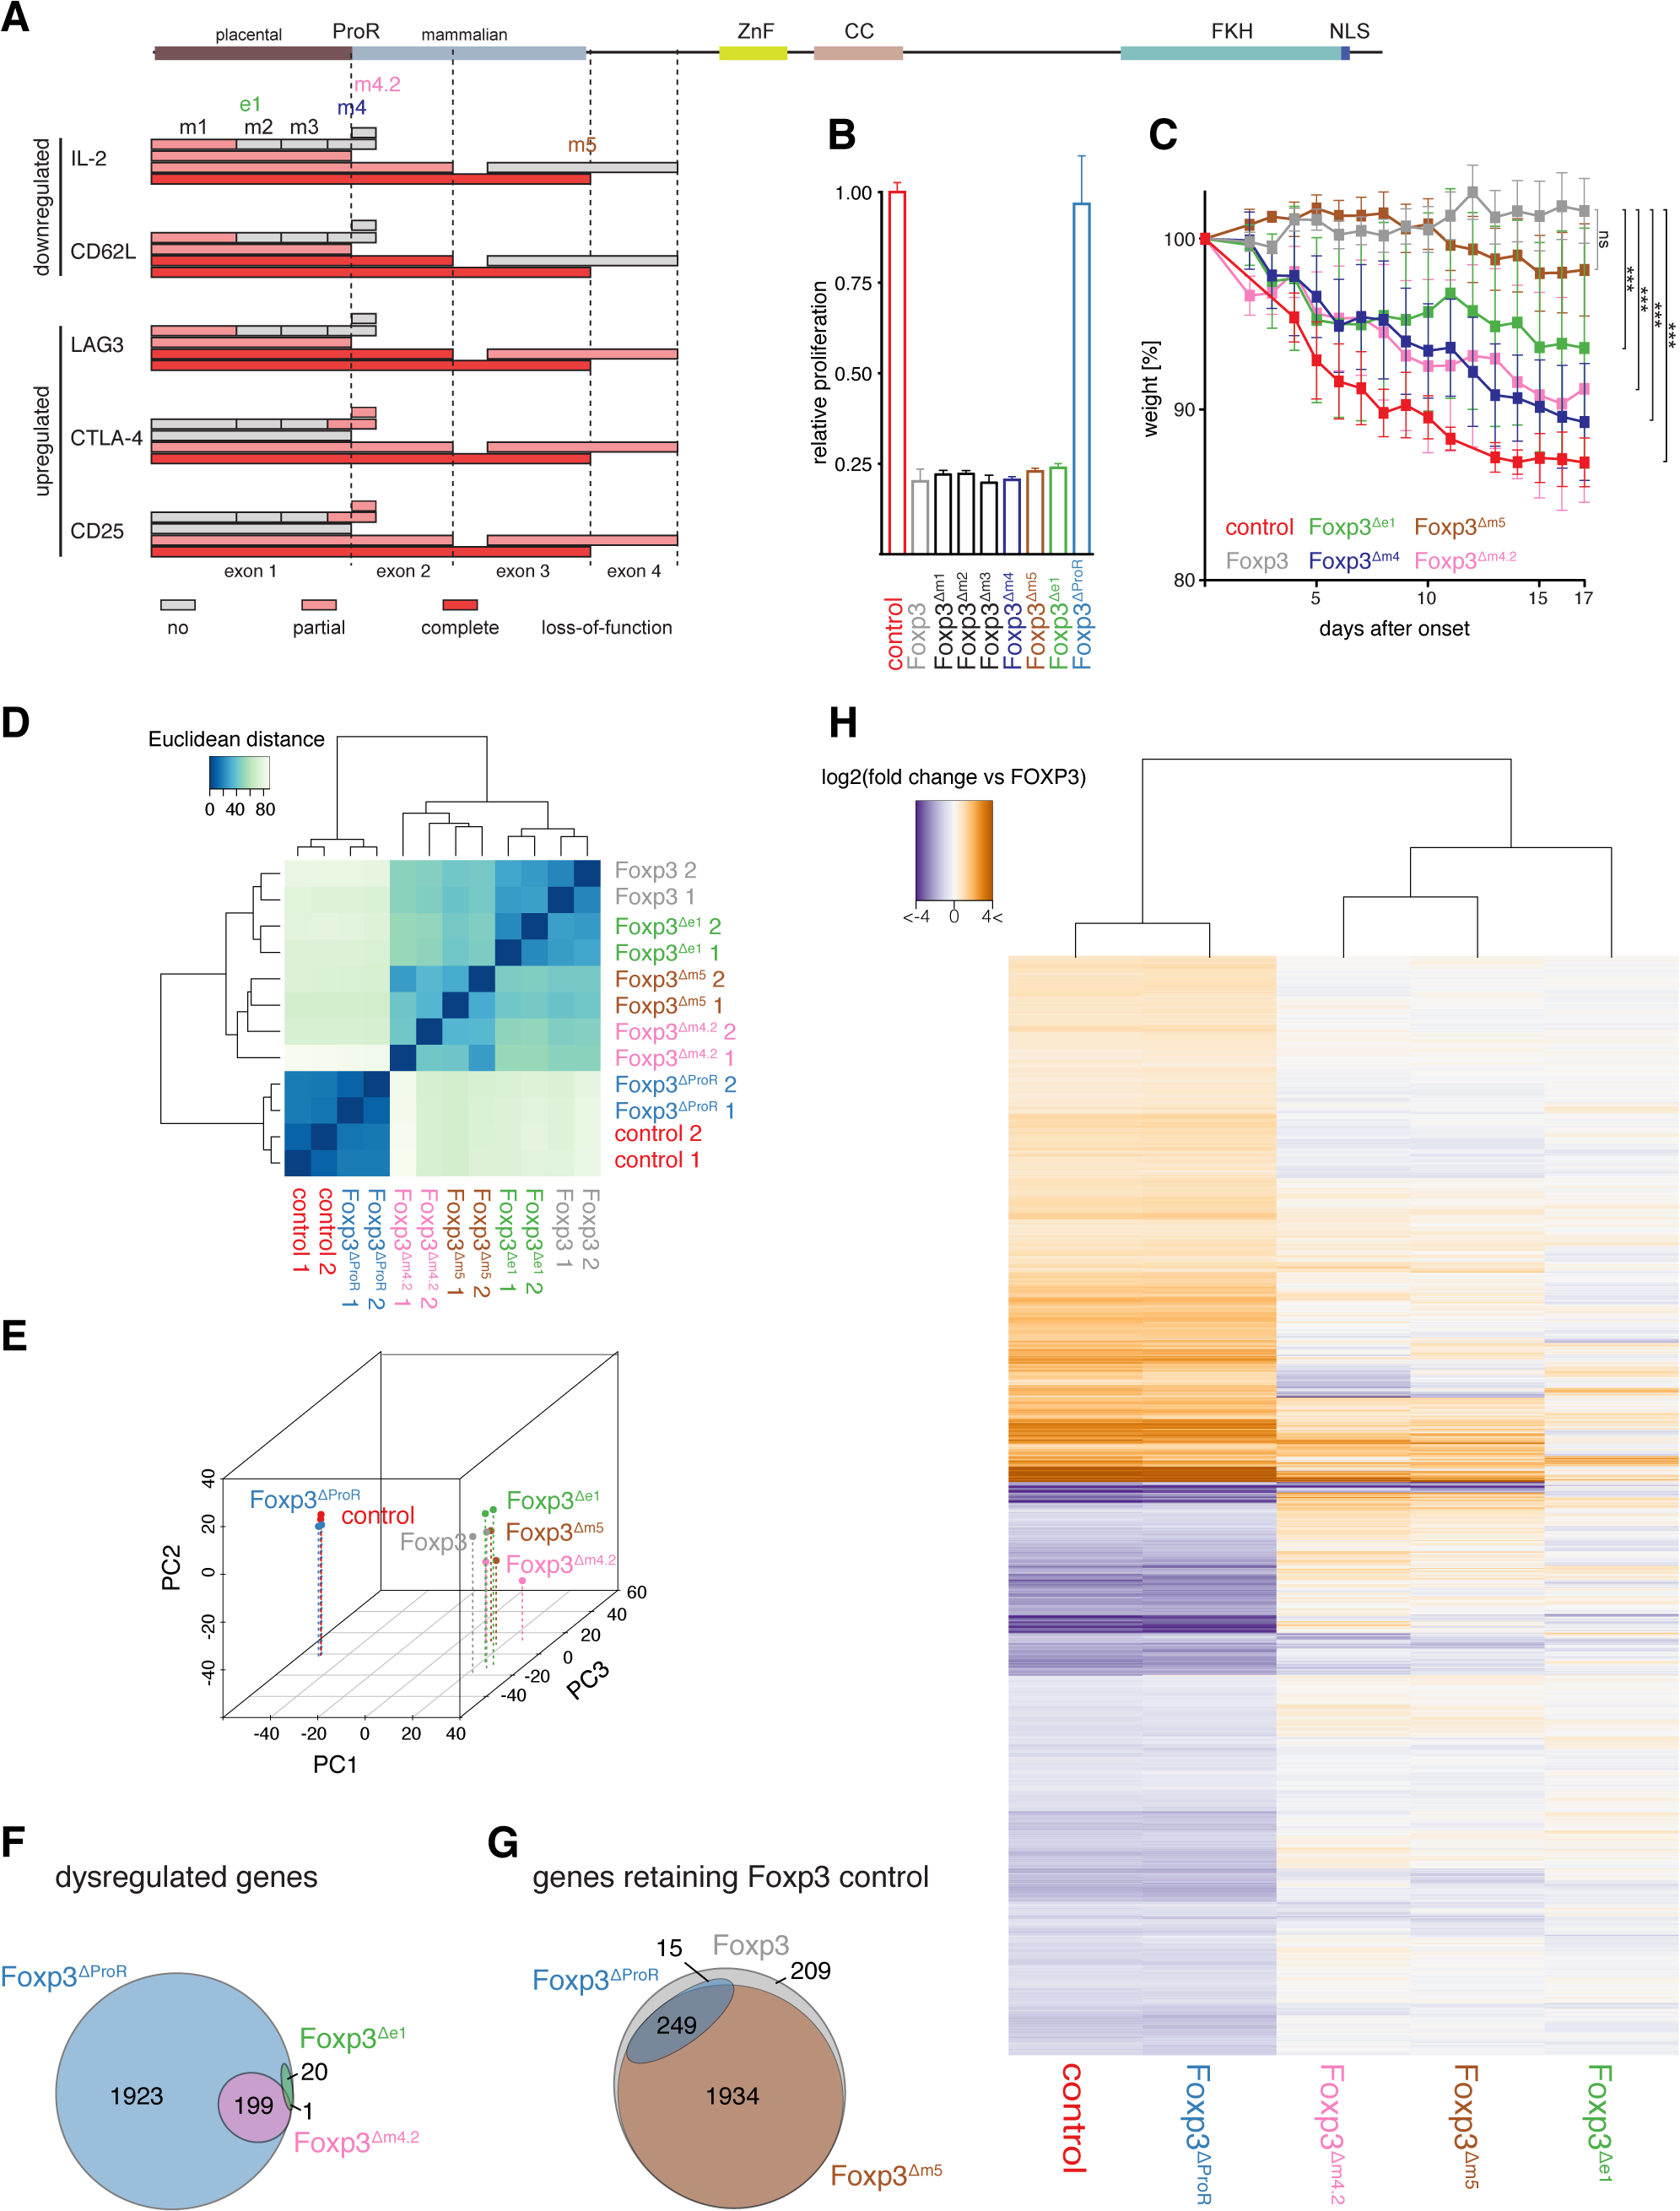 Mutational dissection of ProR of Foxp3 reveals distinct transcriptional programs.